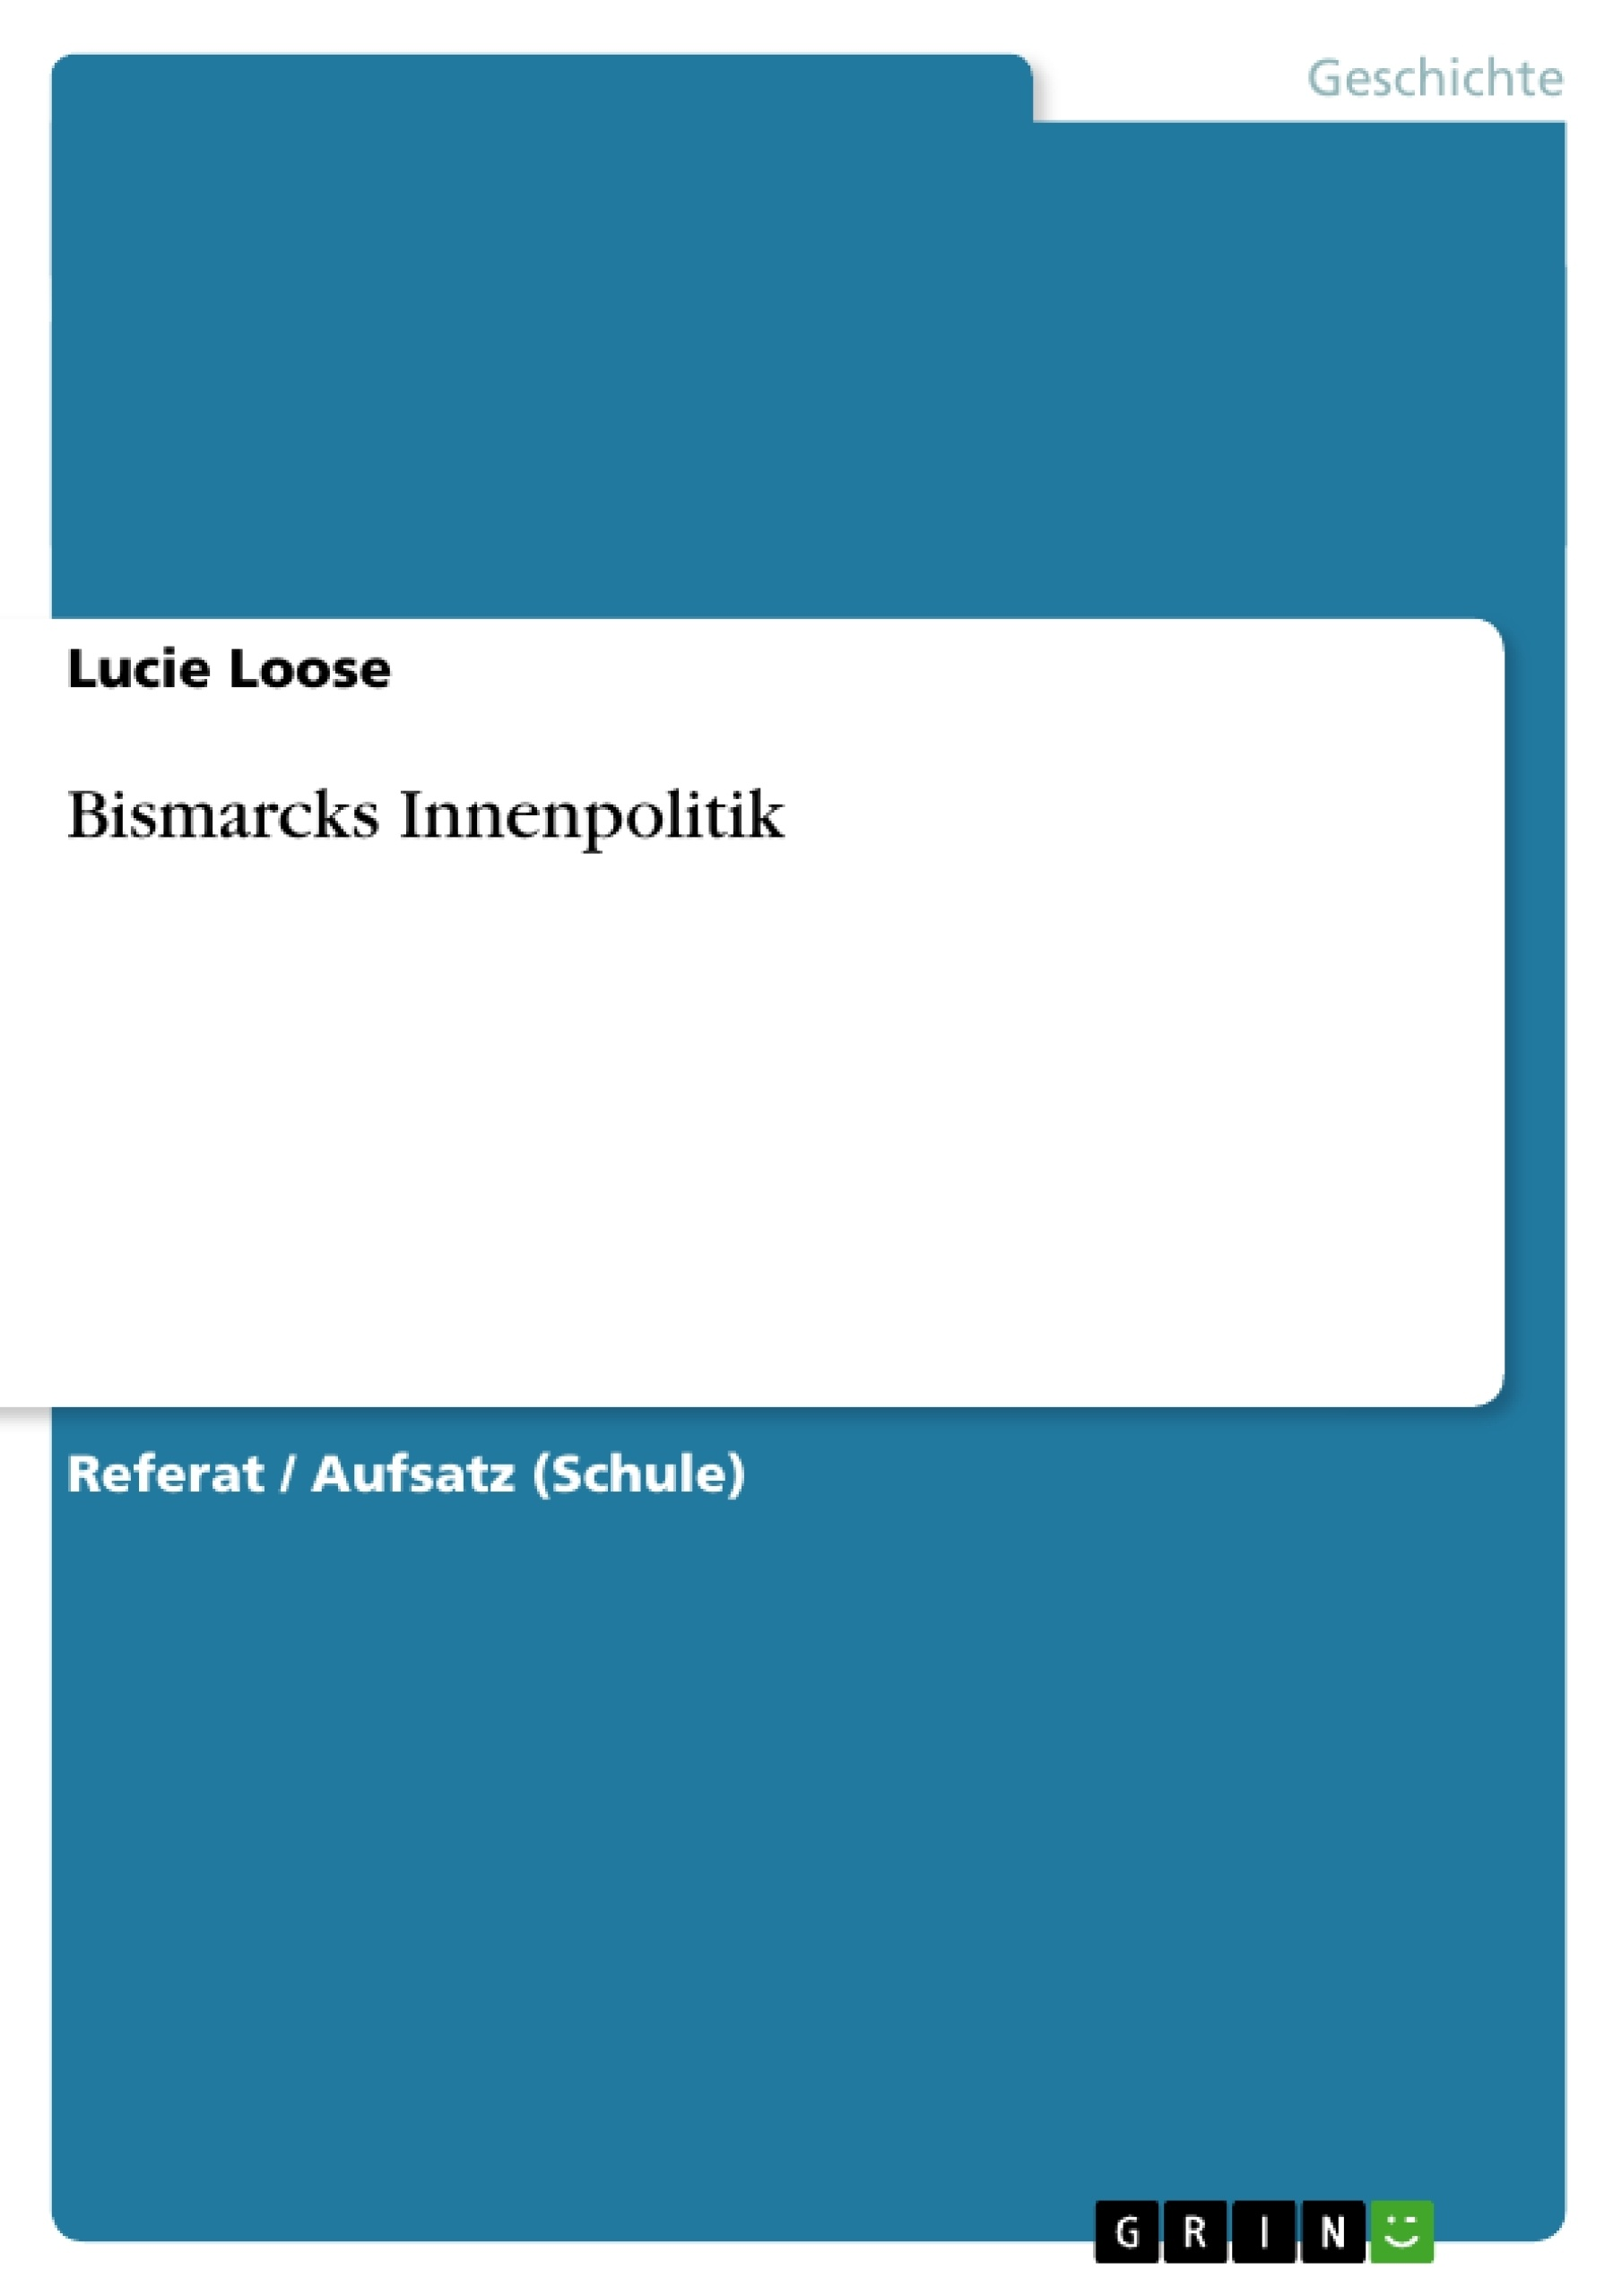 Titel: Bismarcks Innenpolitik